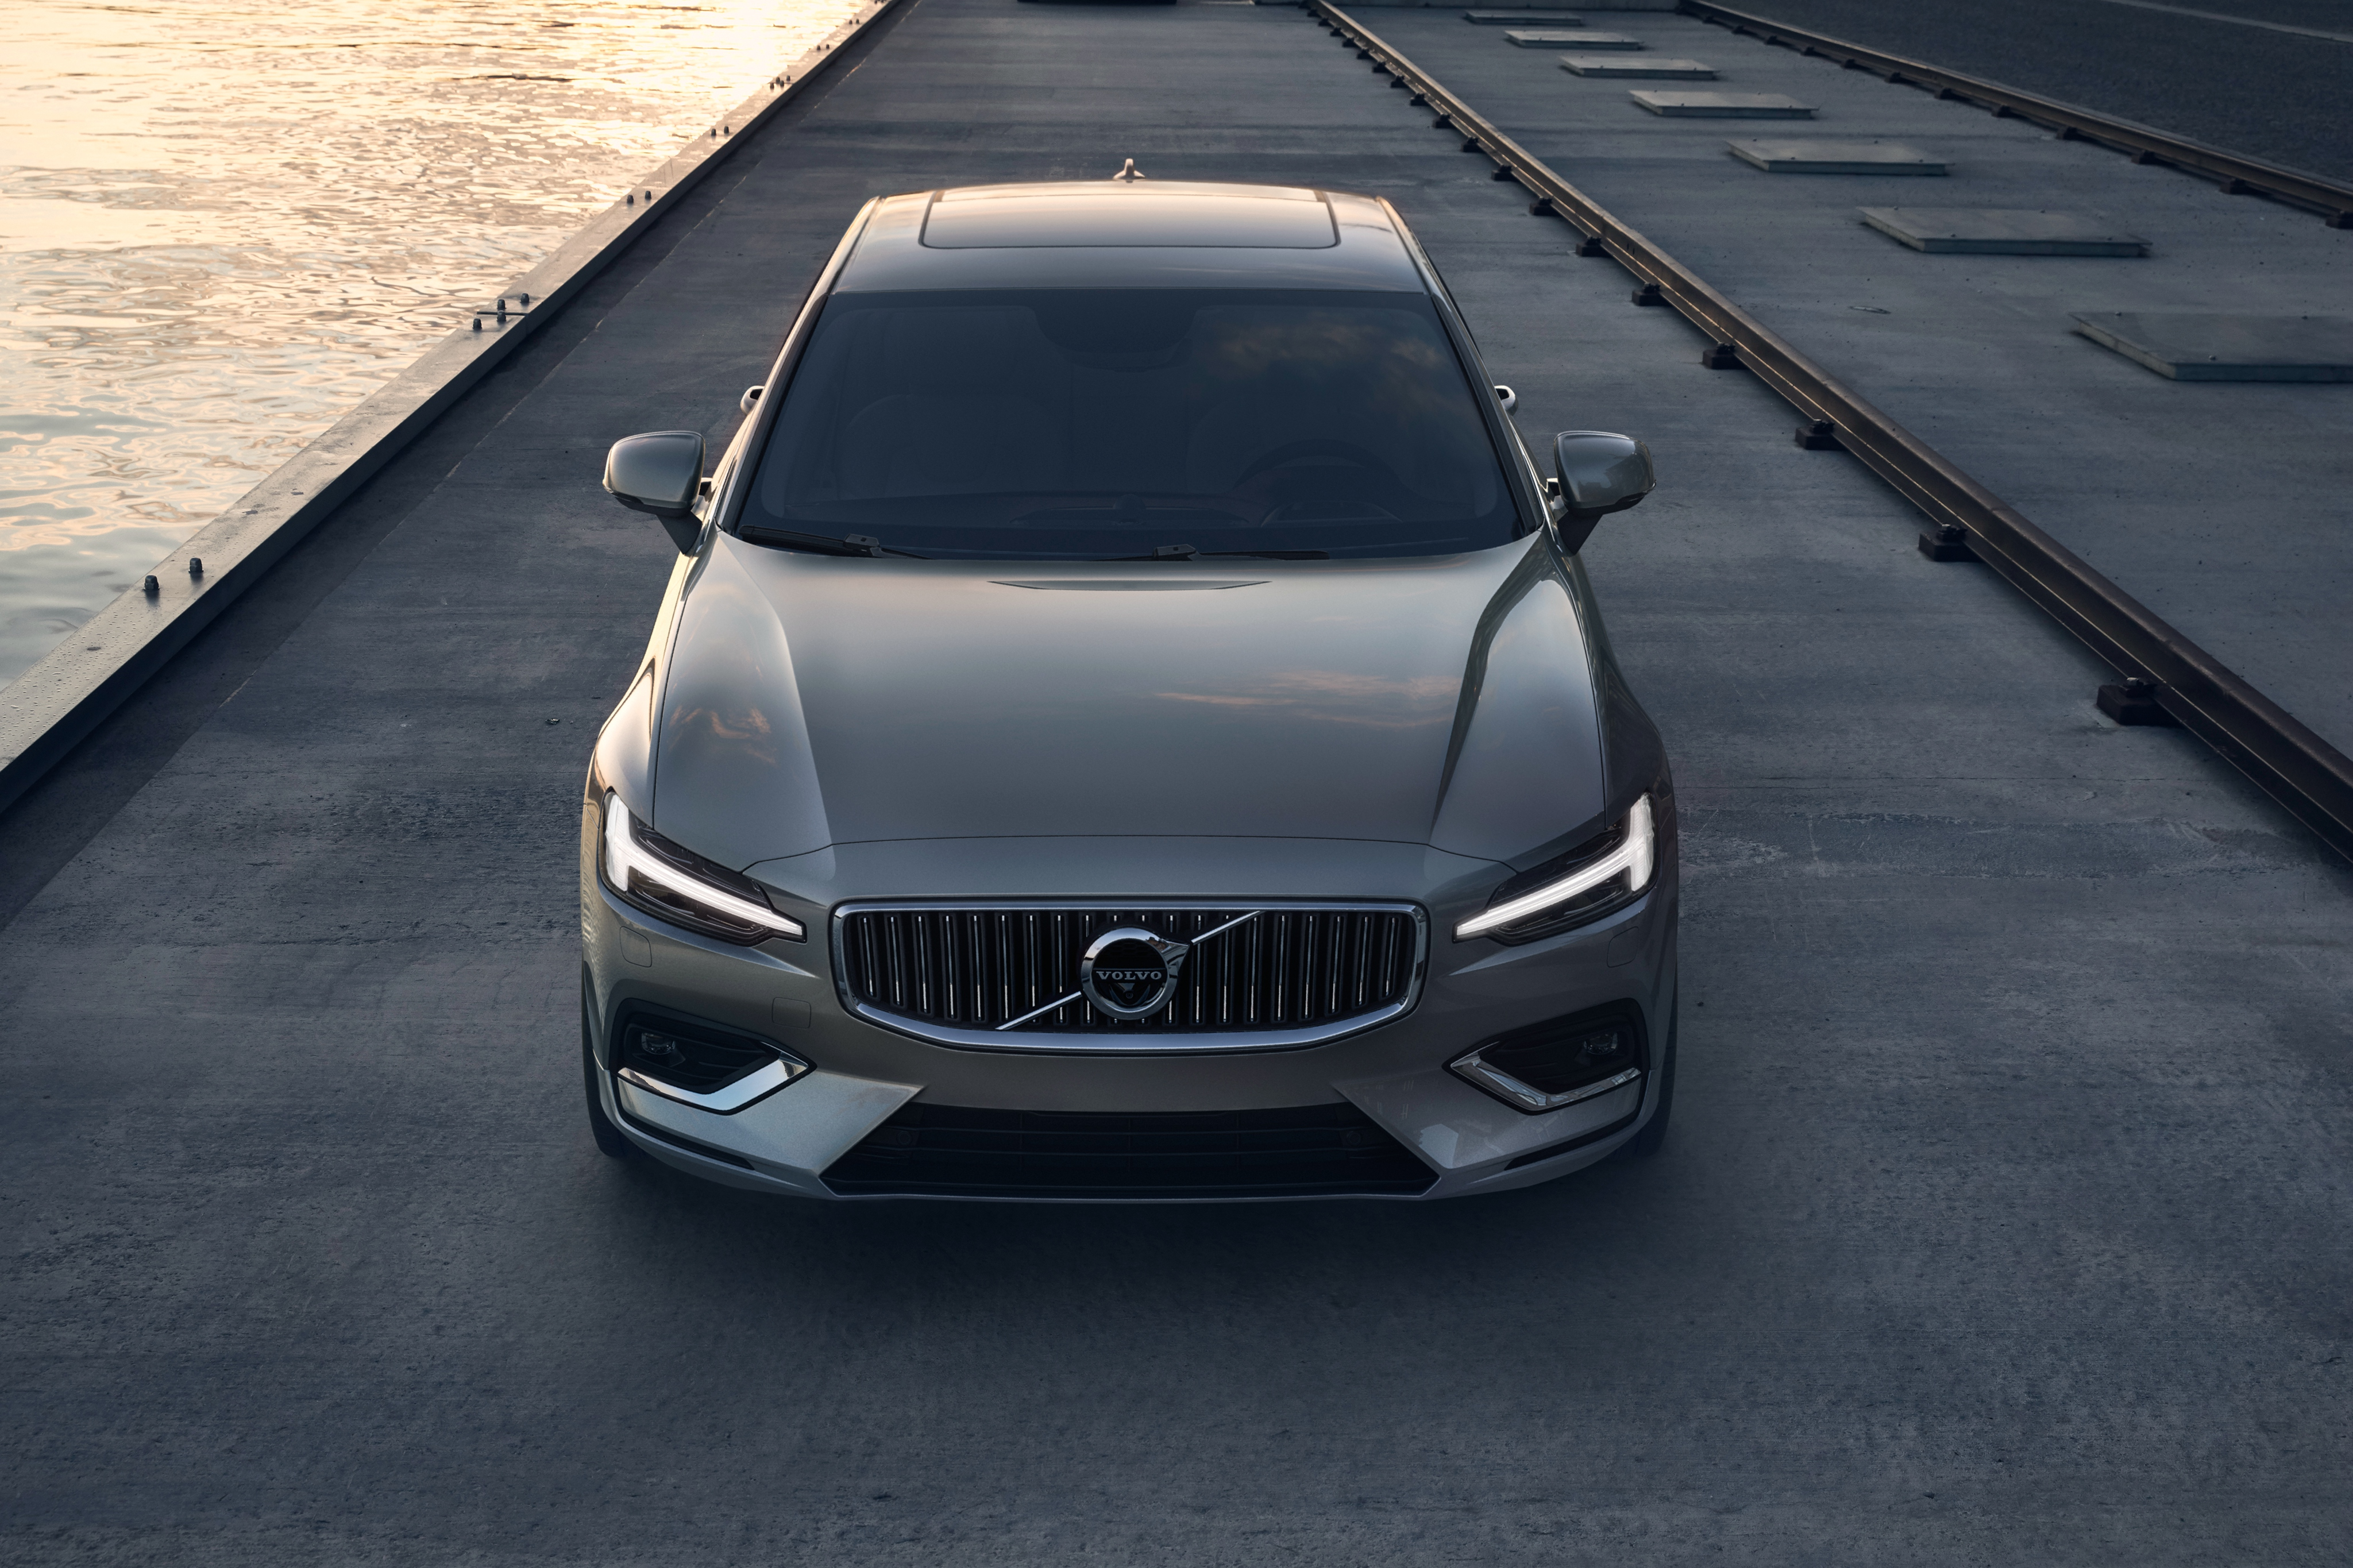 120678 2019 Volvo S60 T6 Inscription 4K Luxury sports sedan 4096x2730